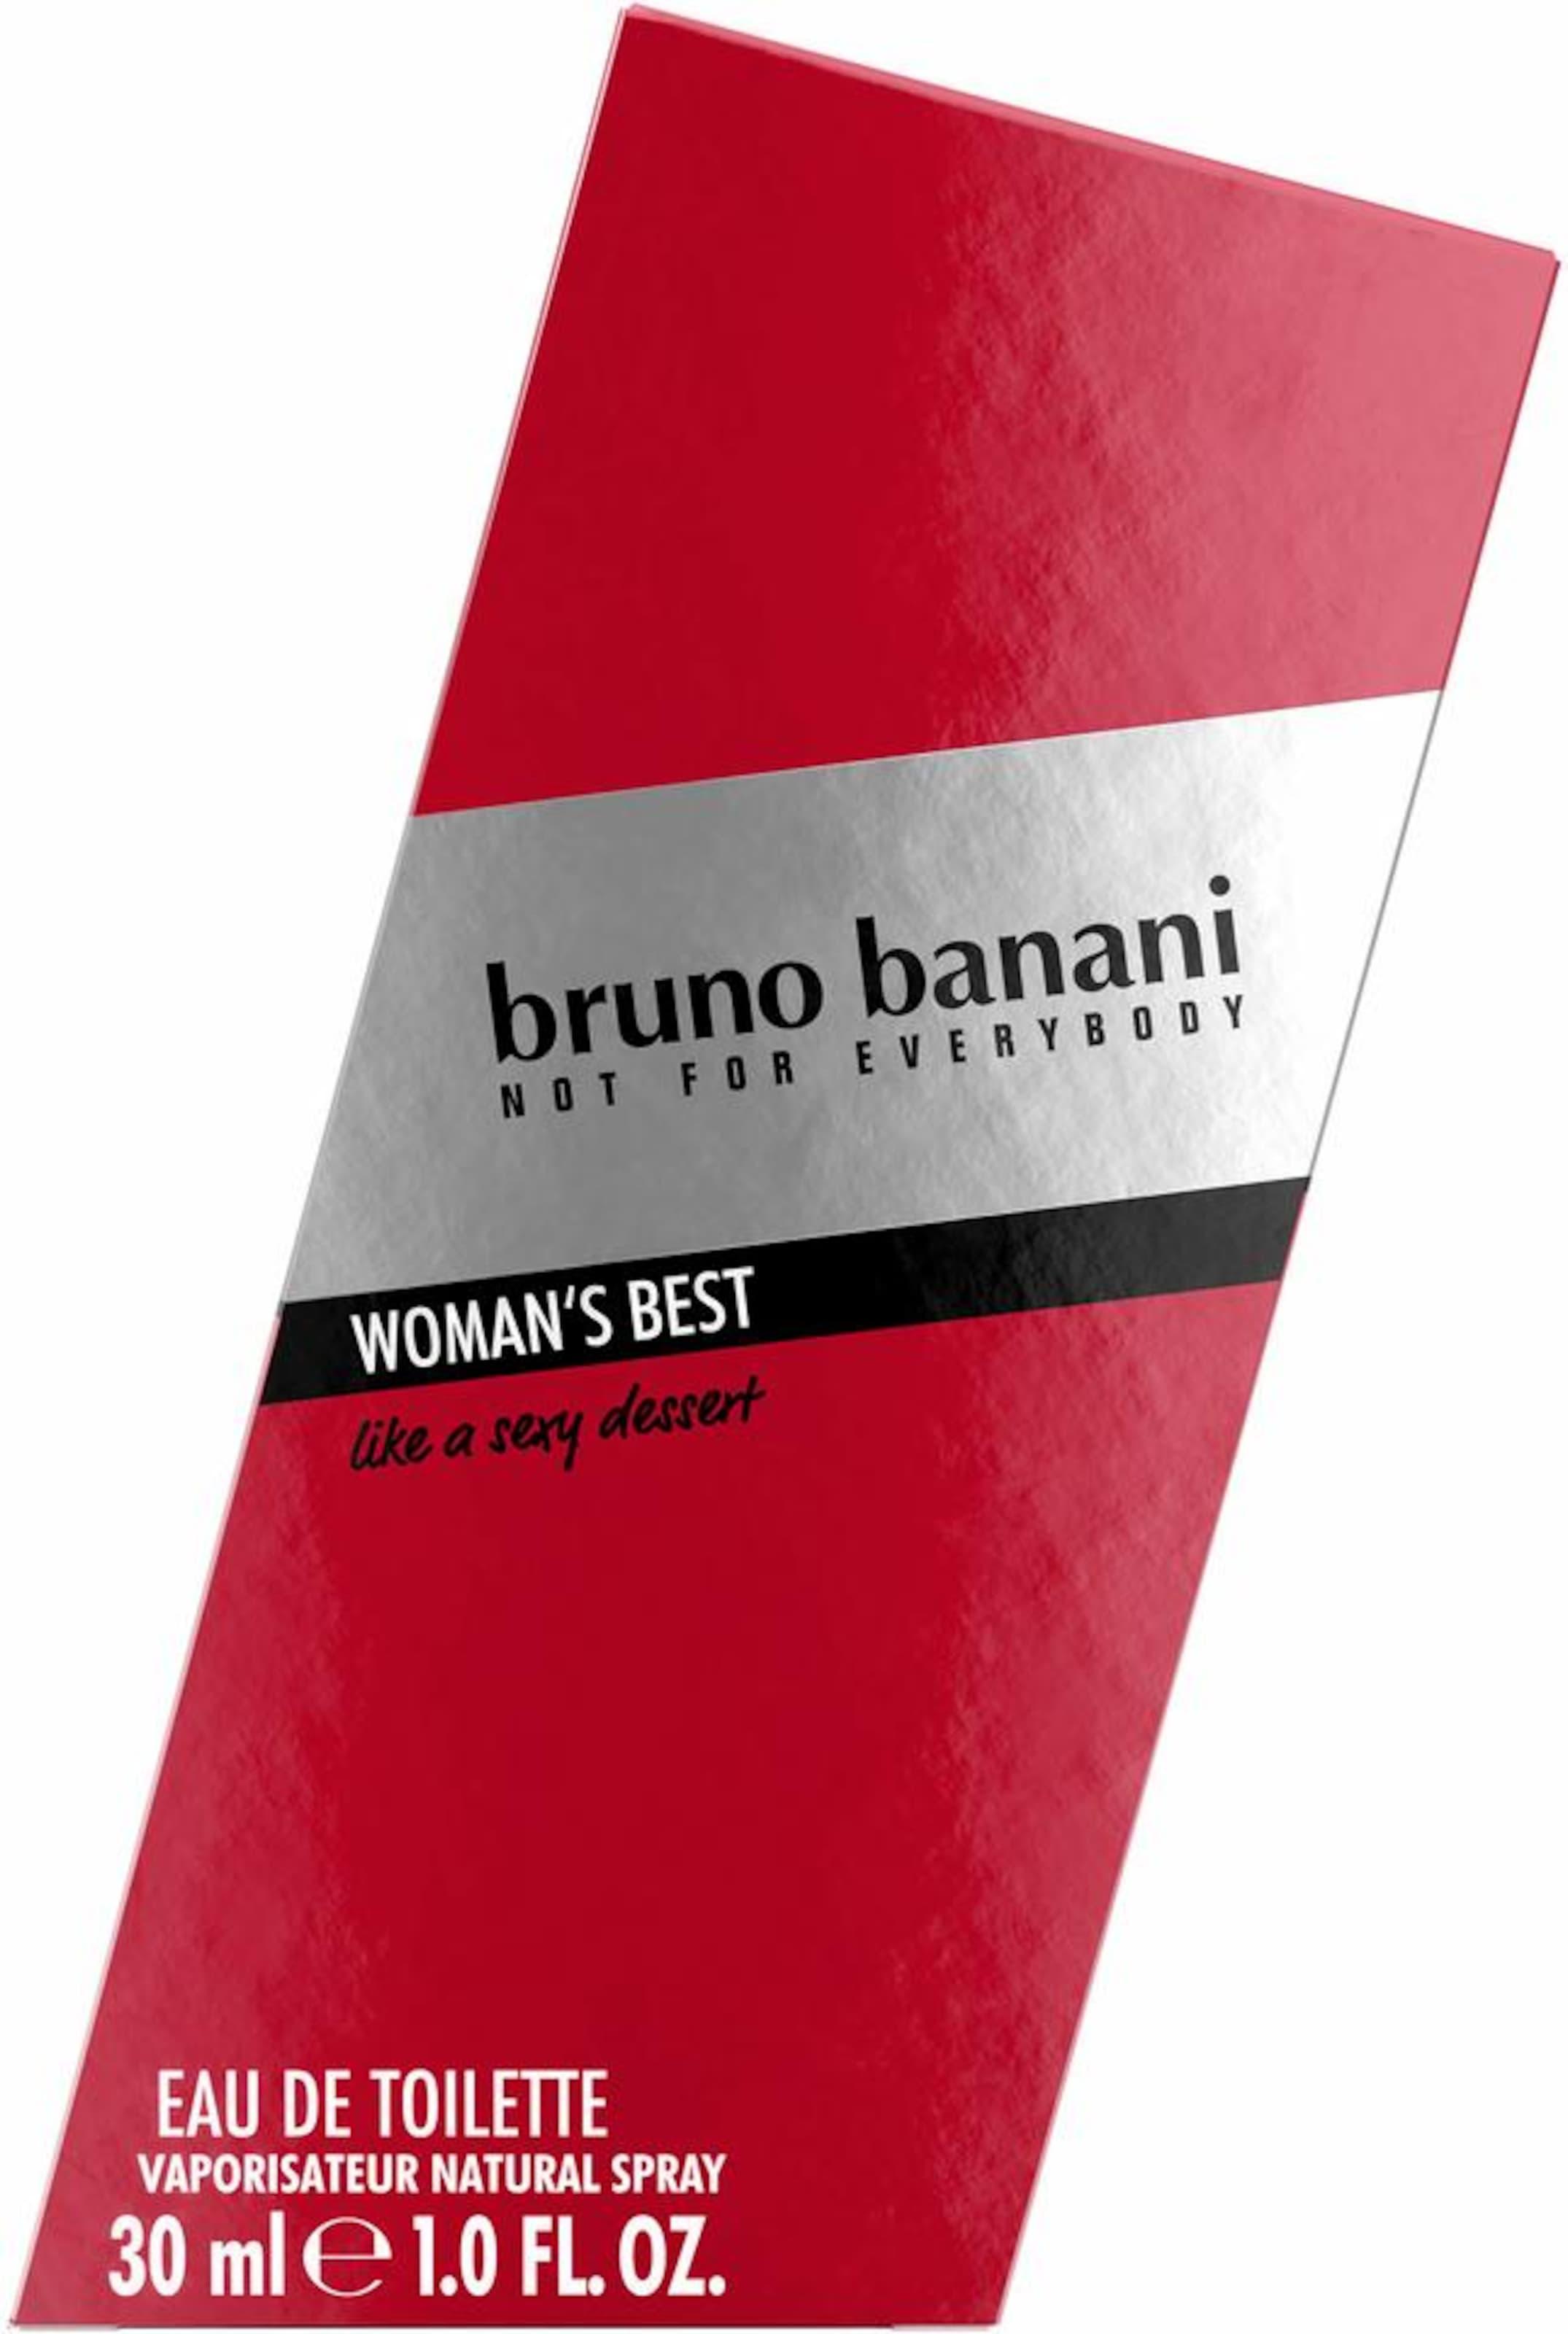 BRUNO BANANI 'Woman's Best', Eau de Toilette